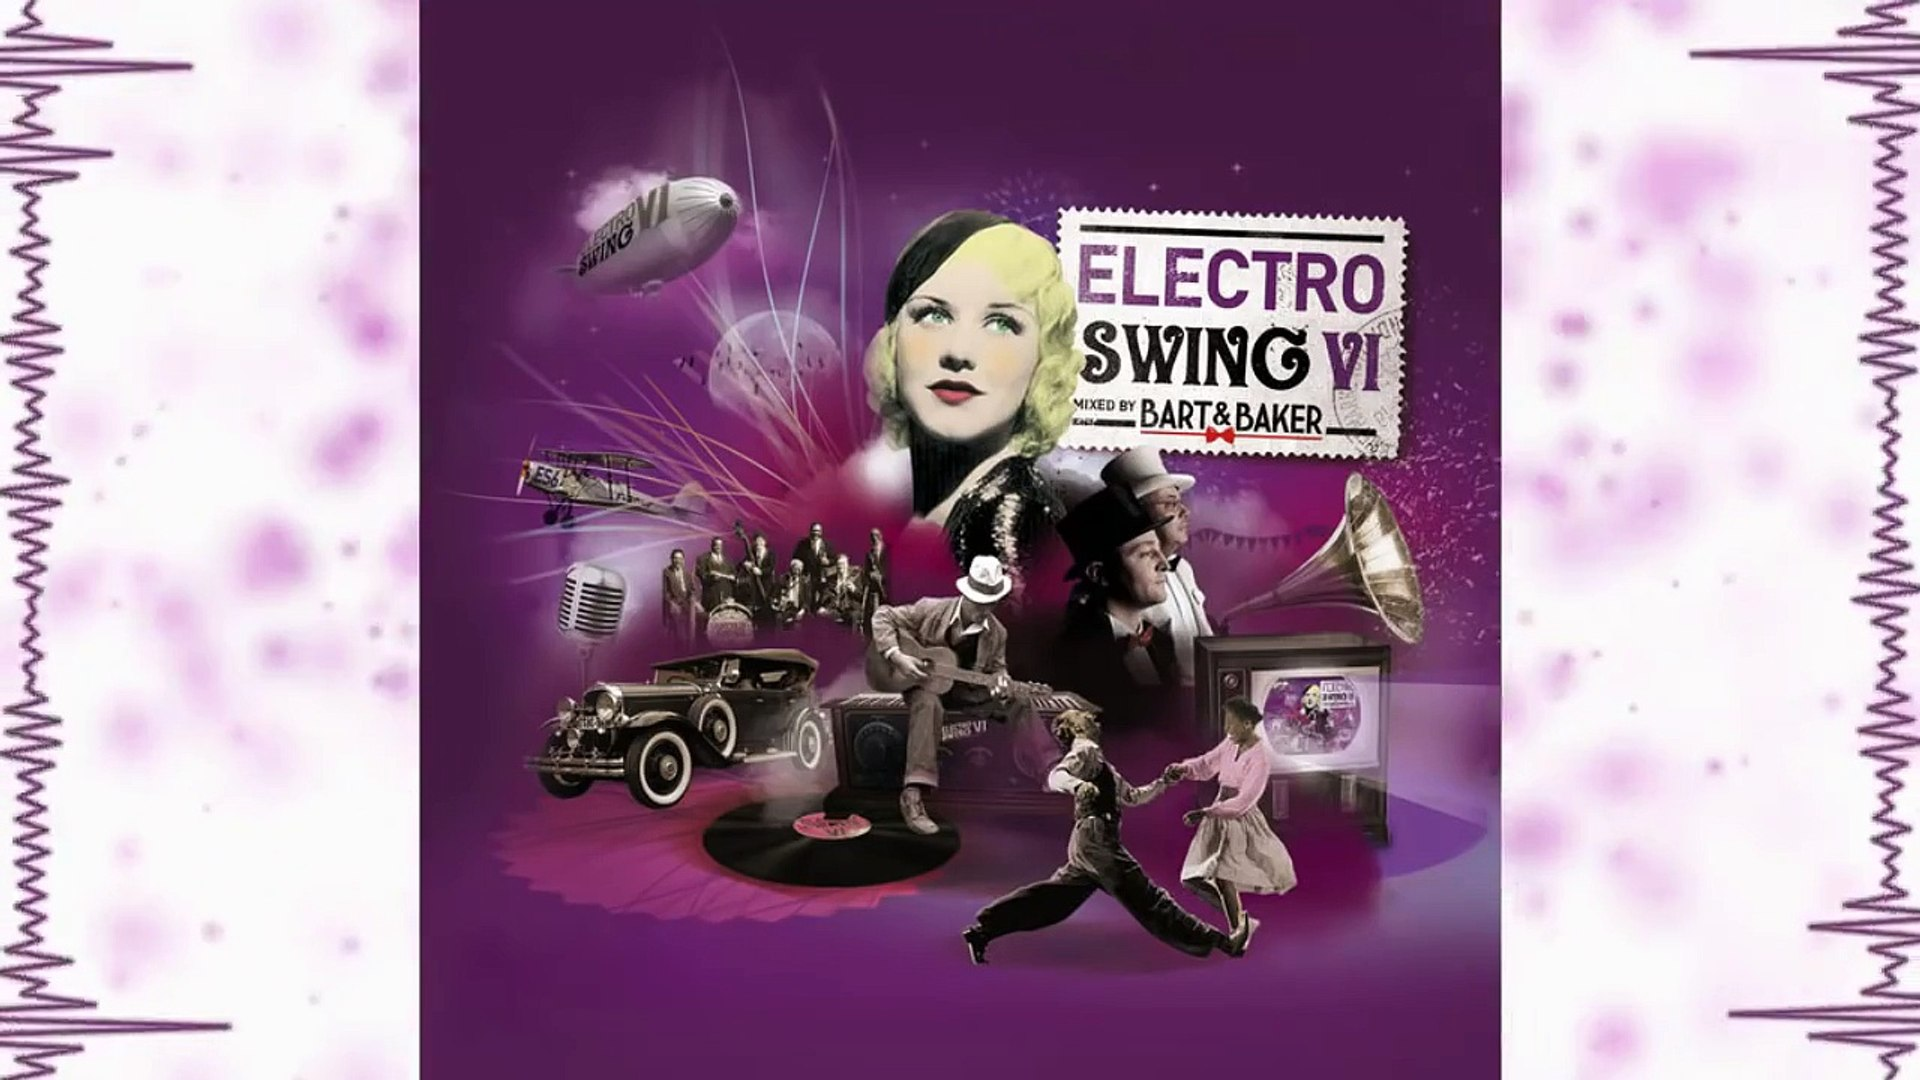 Scott Bradlee Post Modern Jukebox Thrift Shop Bartbaker Electro Swing Club Remix